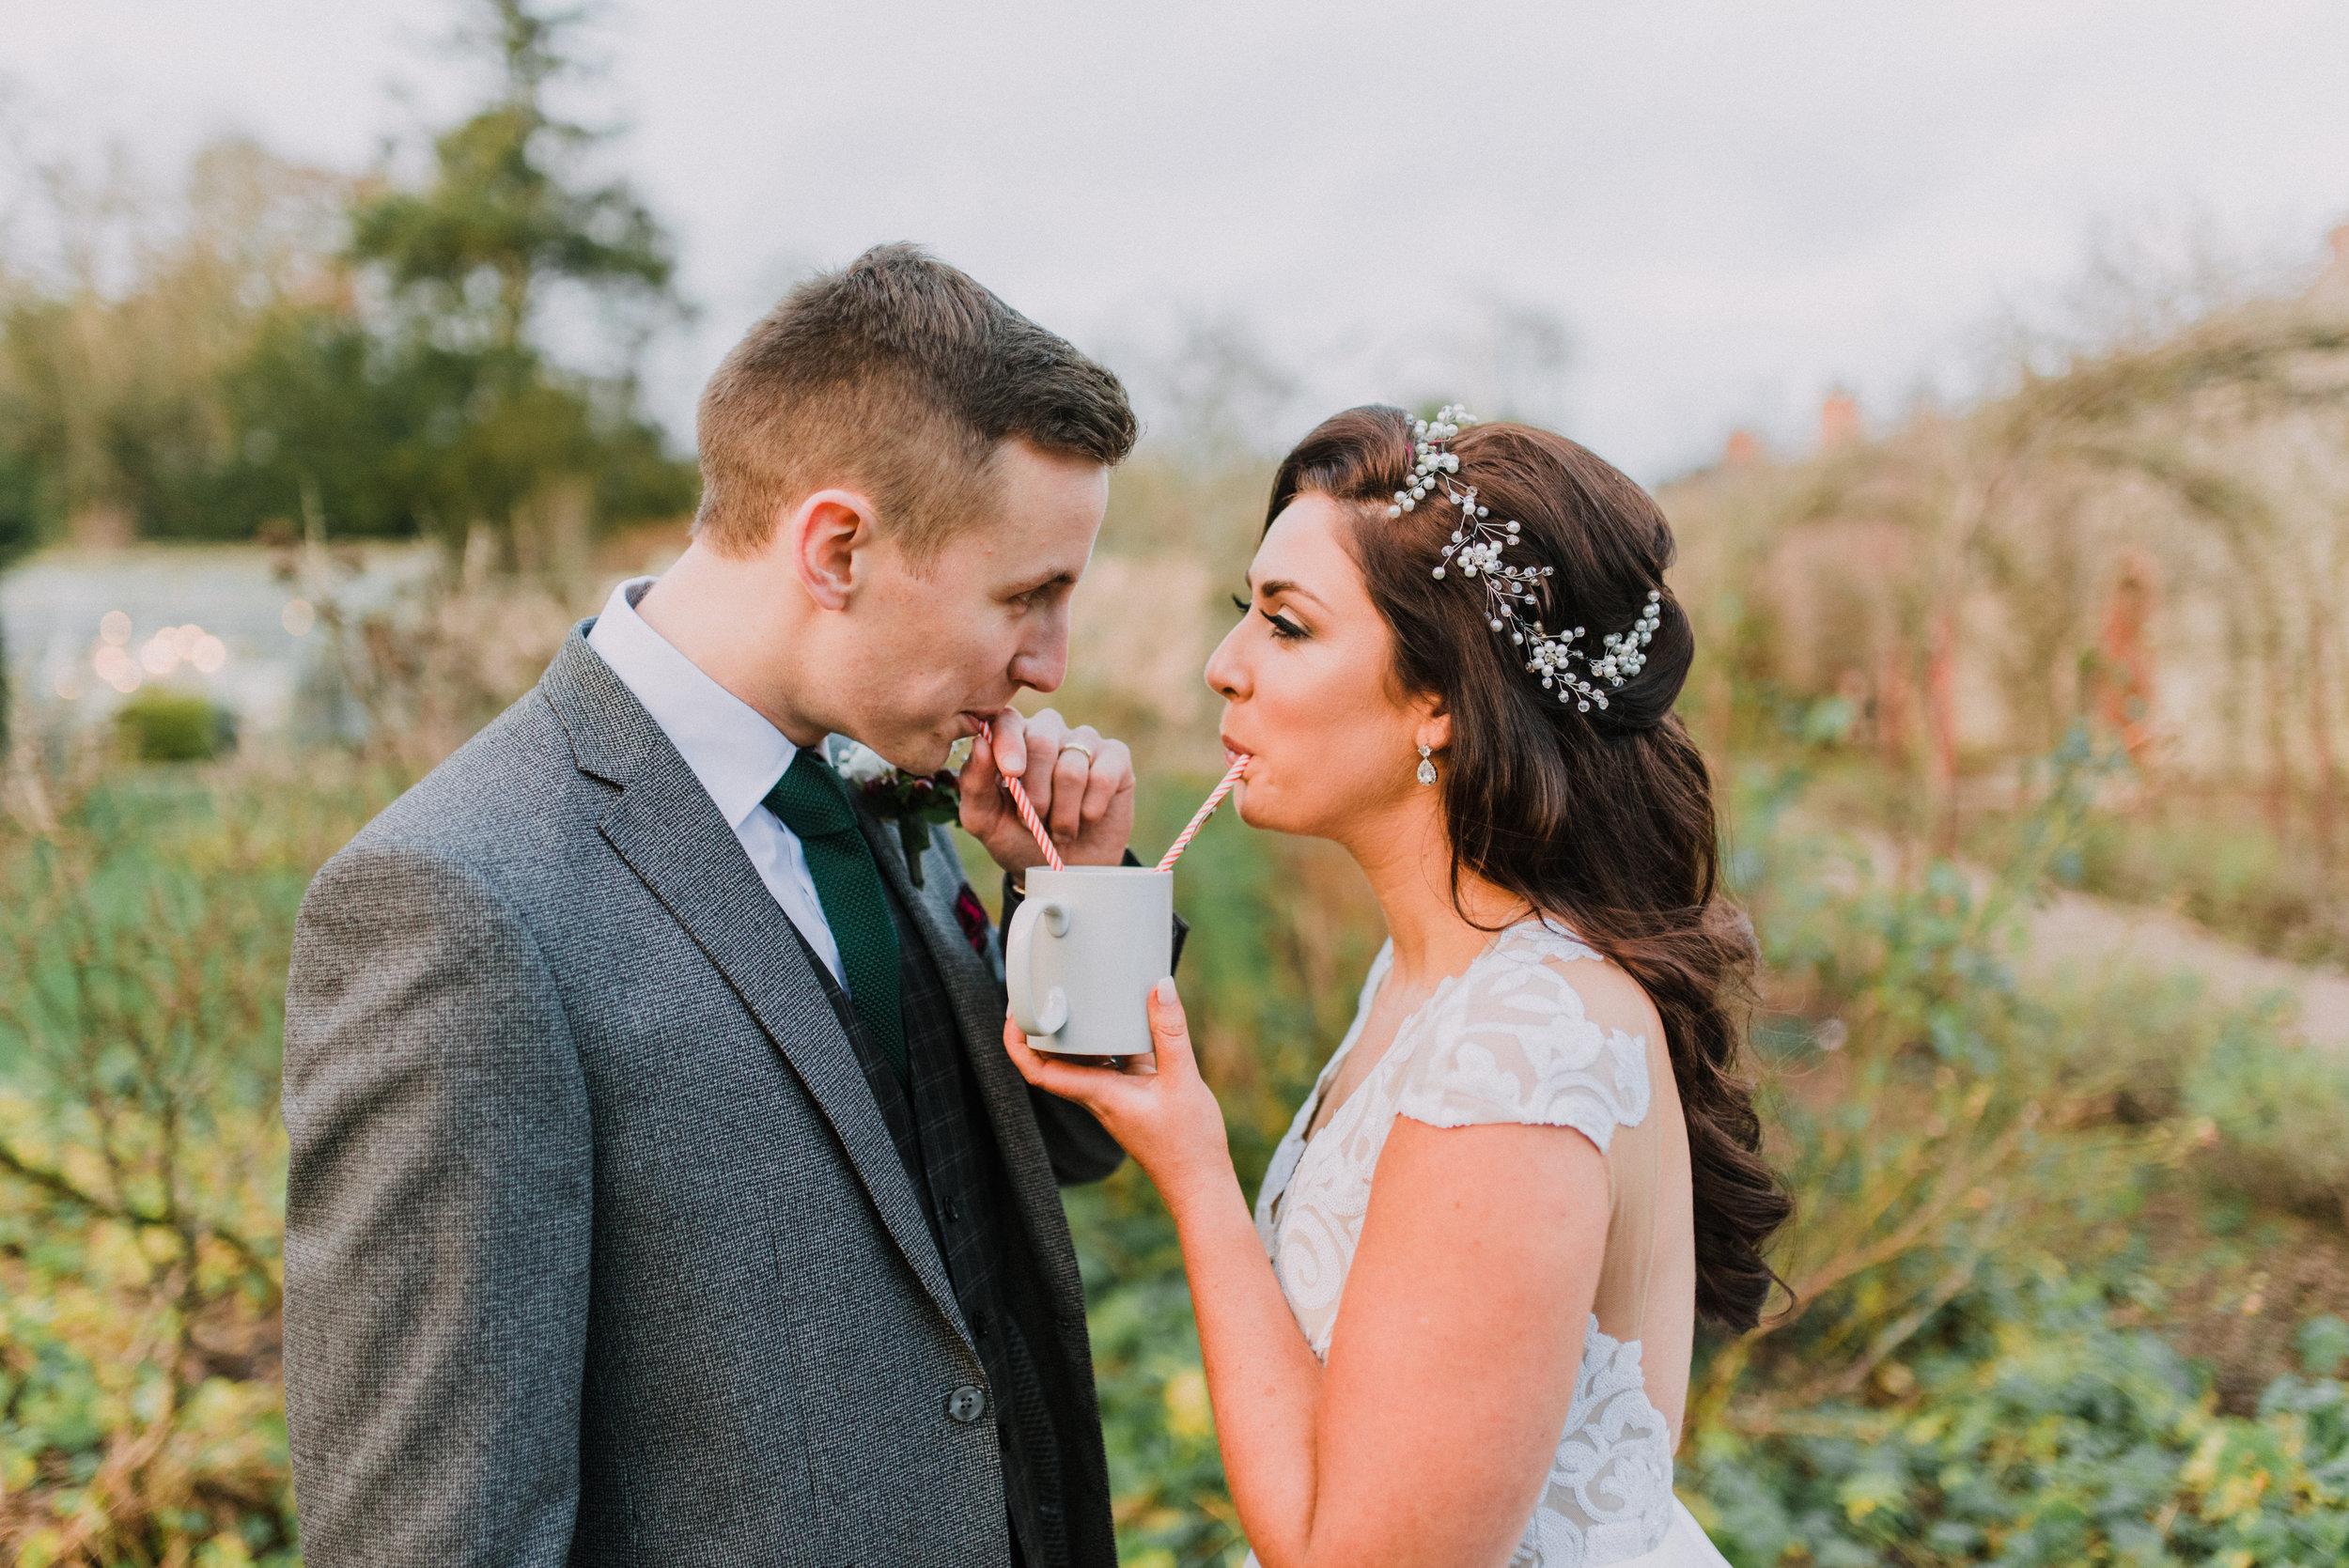 larchfield estate wedding, wedding venues northern ireland, barn wedding venues northern ireland, quirky weddings ni, wedding photos larchfield estate, shane todd wedding, best wedding venues n (6).jpg